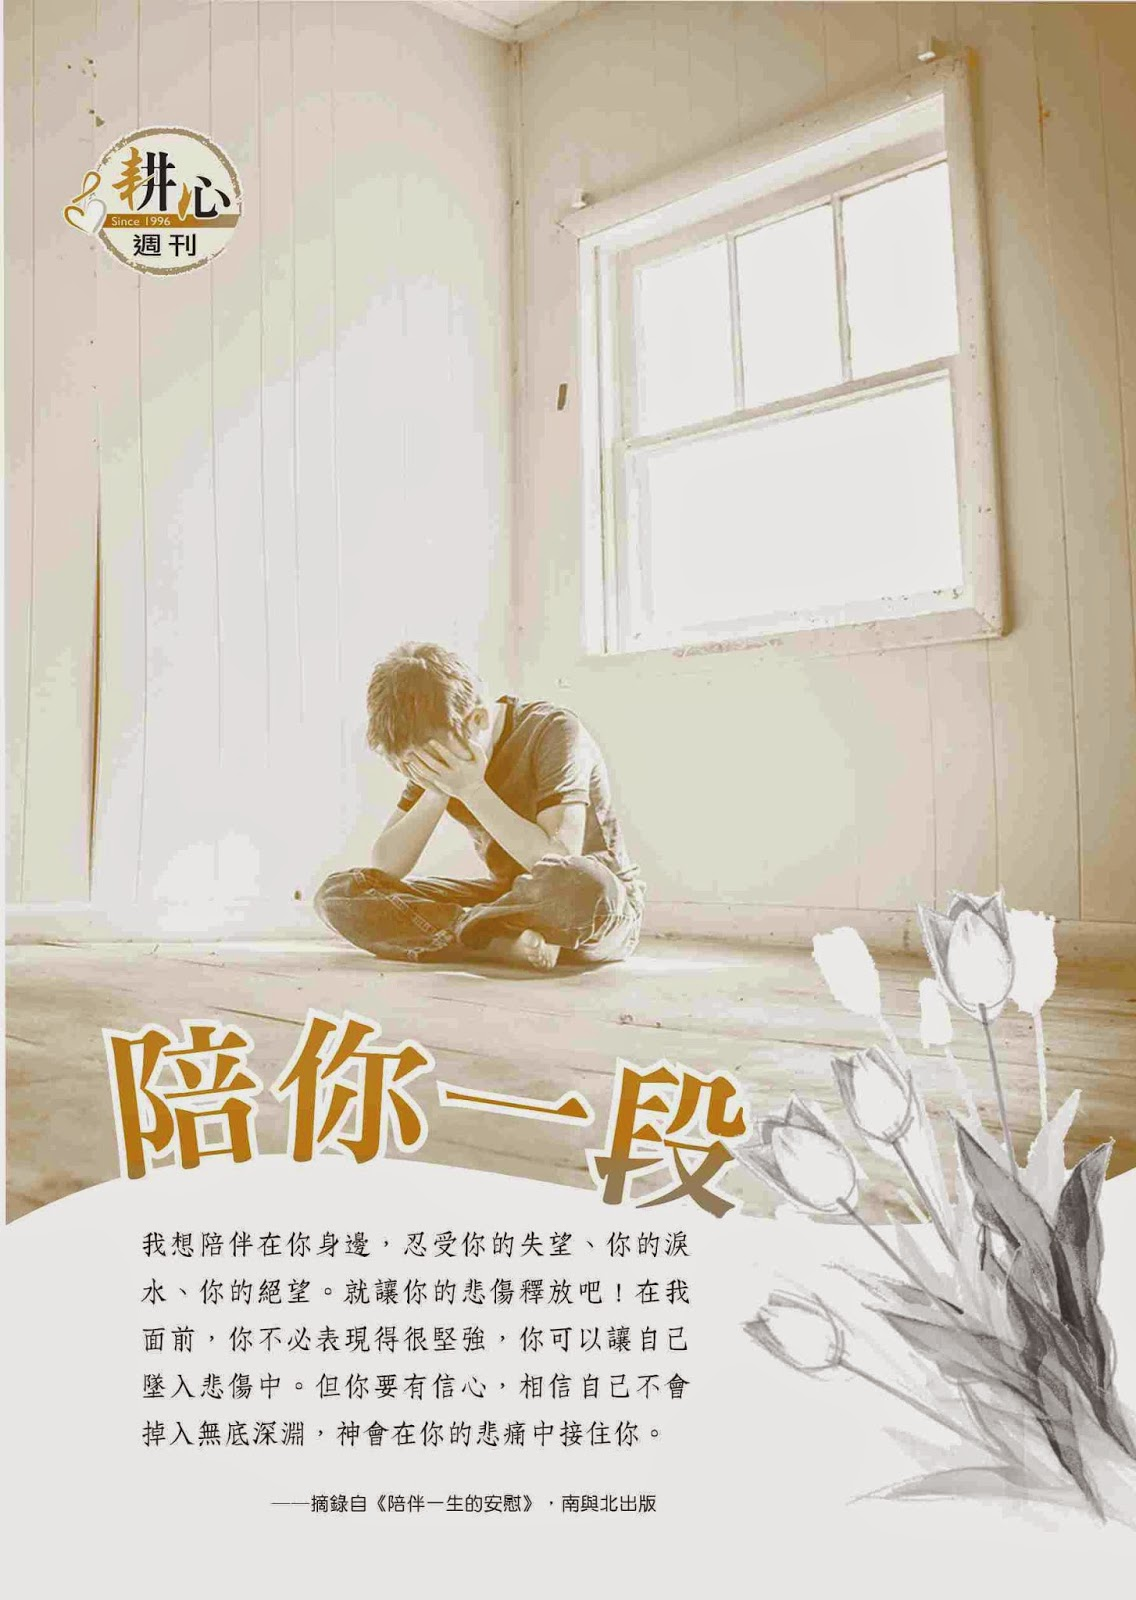 耕心週刊 (Heart Farmer) - 20140831